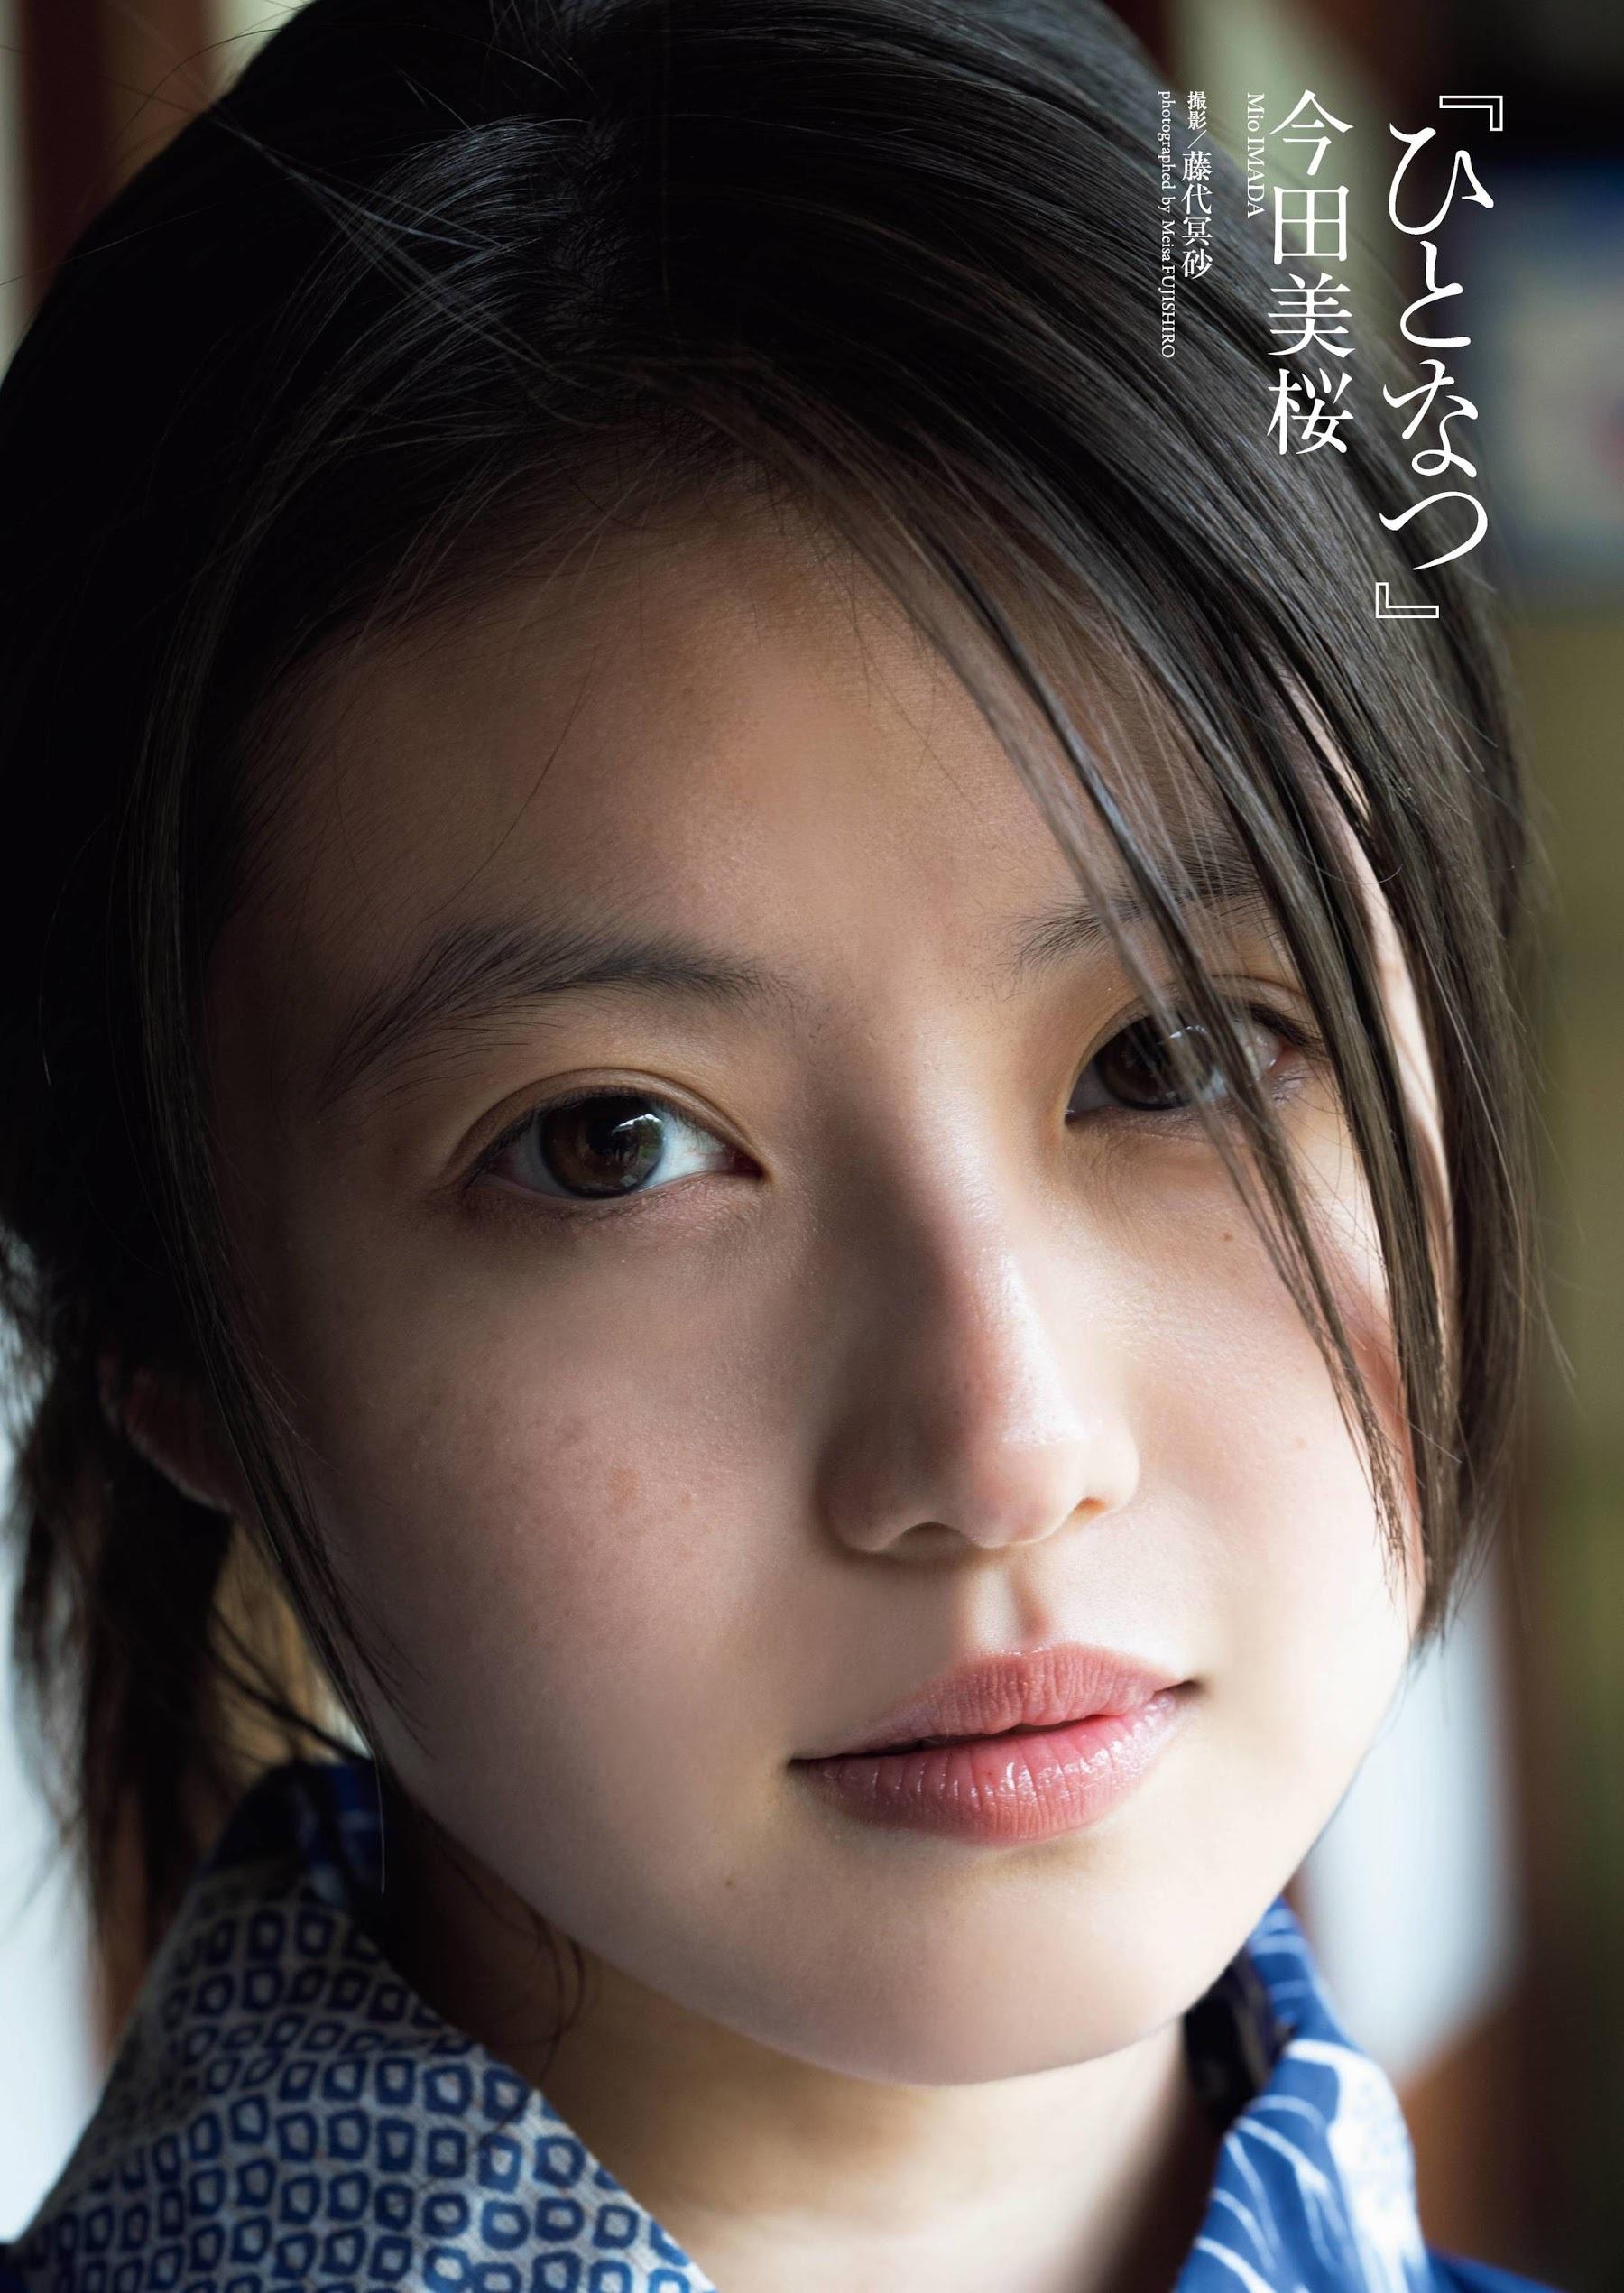 今田美樱-WEEKLY PLAYBOY 2021年第二十四期  高清套图 第1张